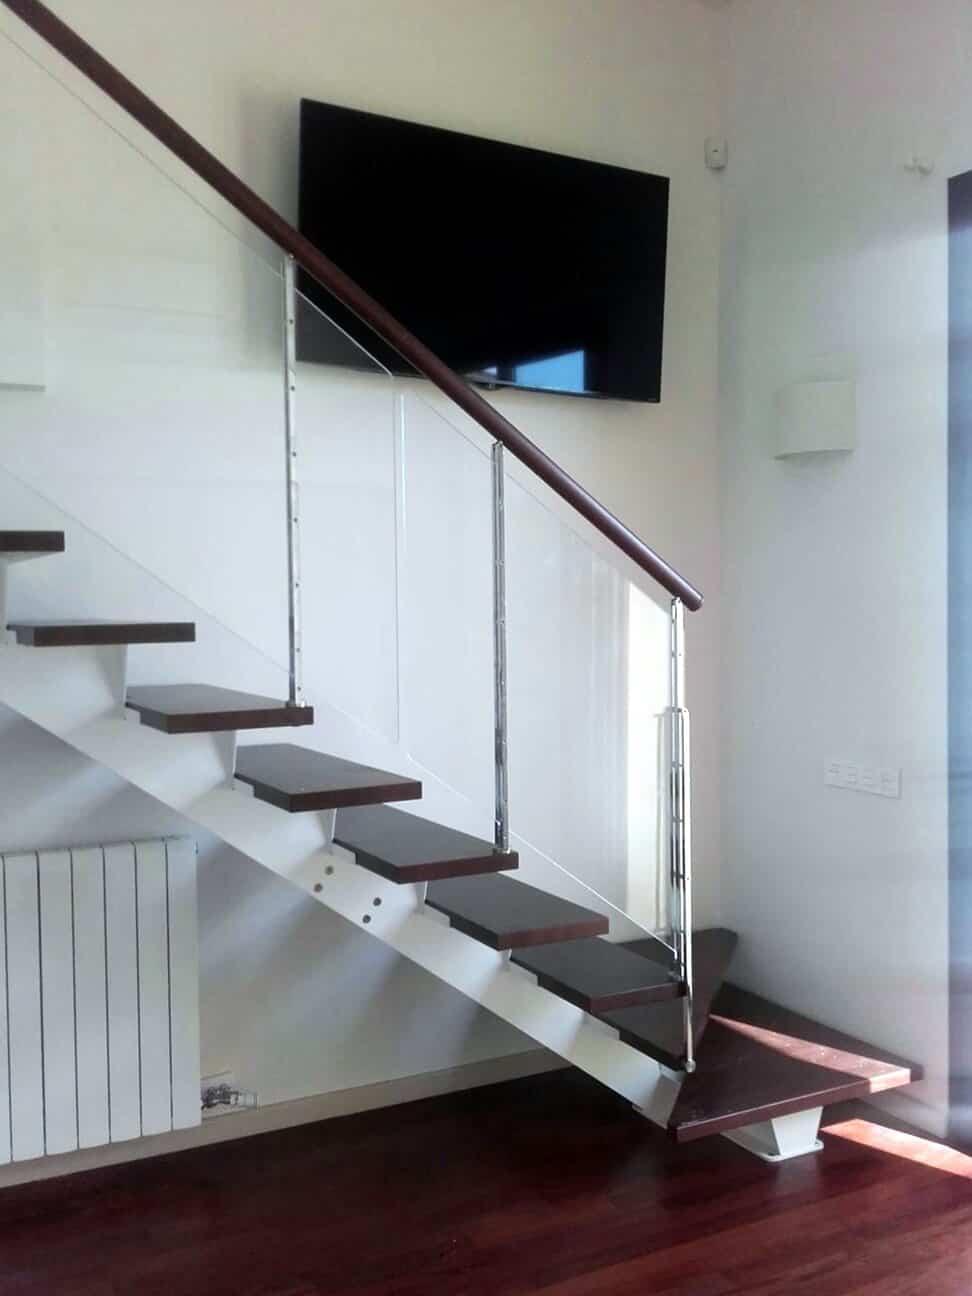 Escalera recta con baranda de cristal de Enesca